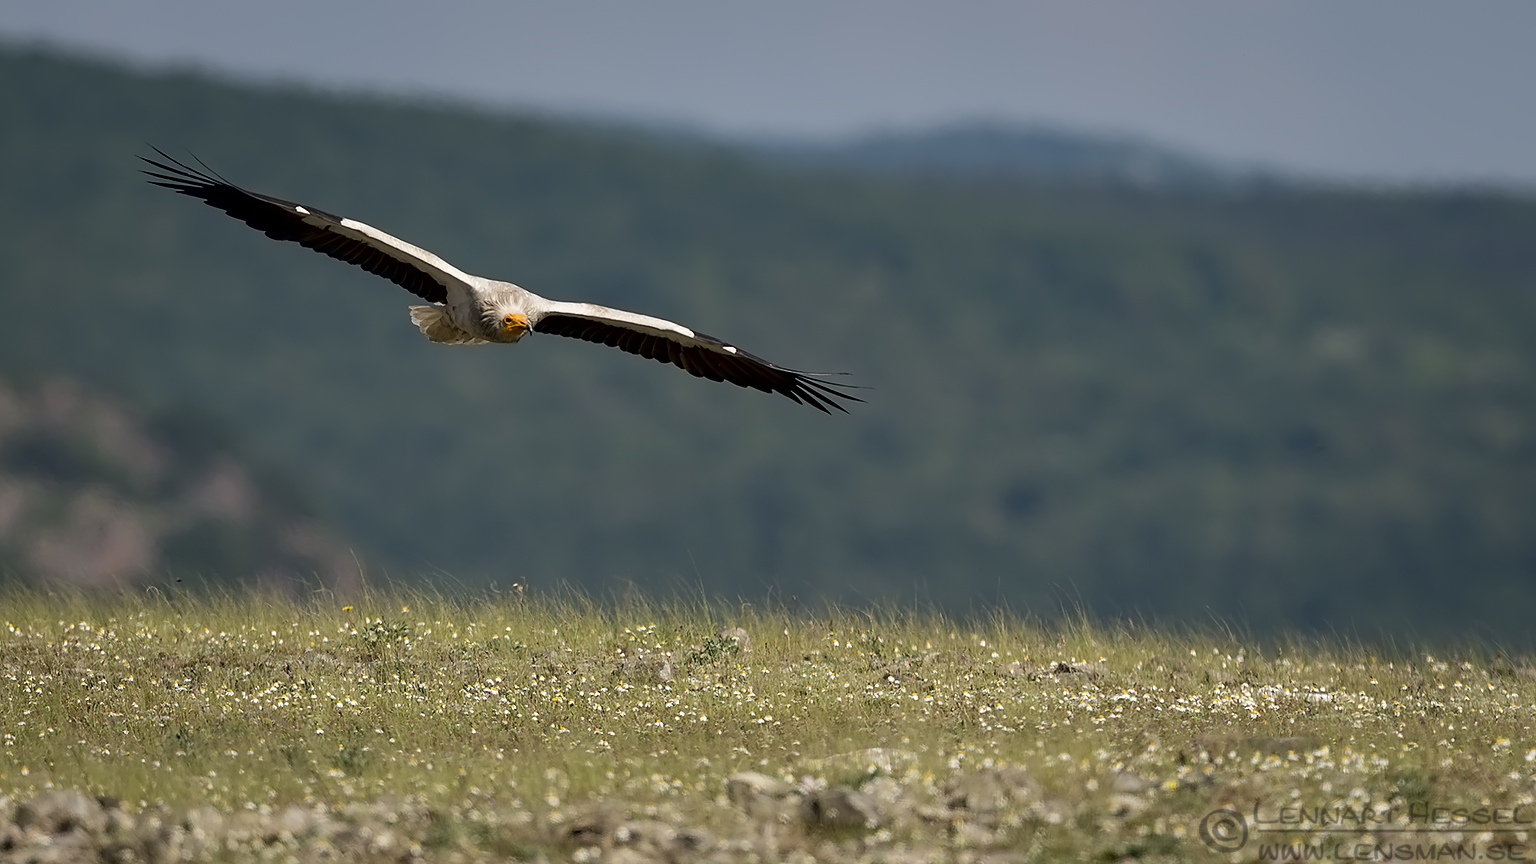 Flying Egyptian Vulture Bulgaria 2016